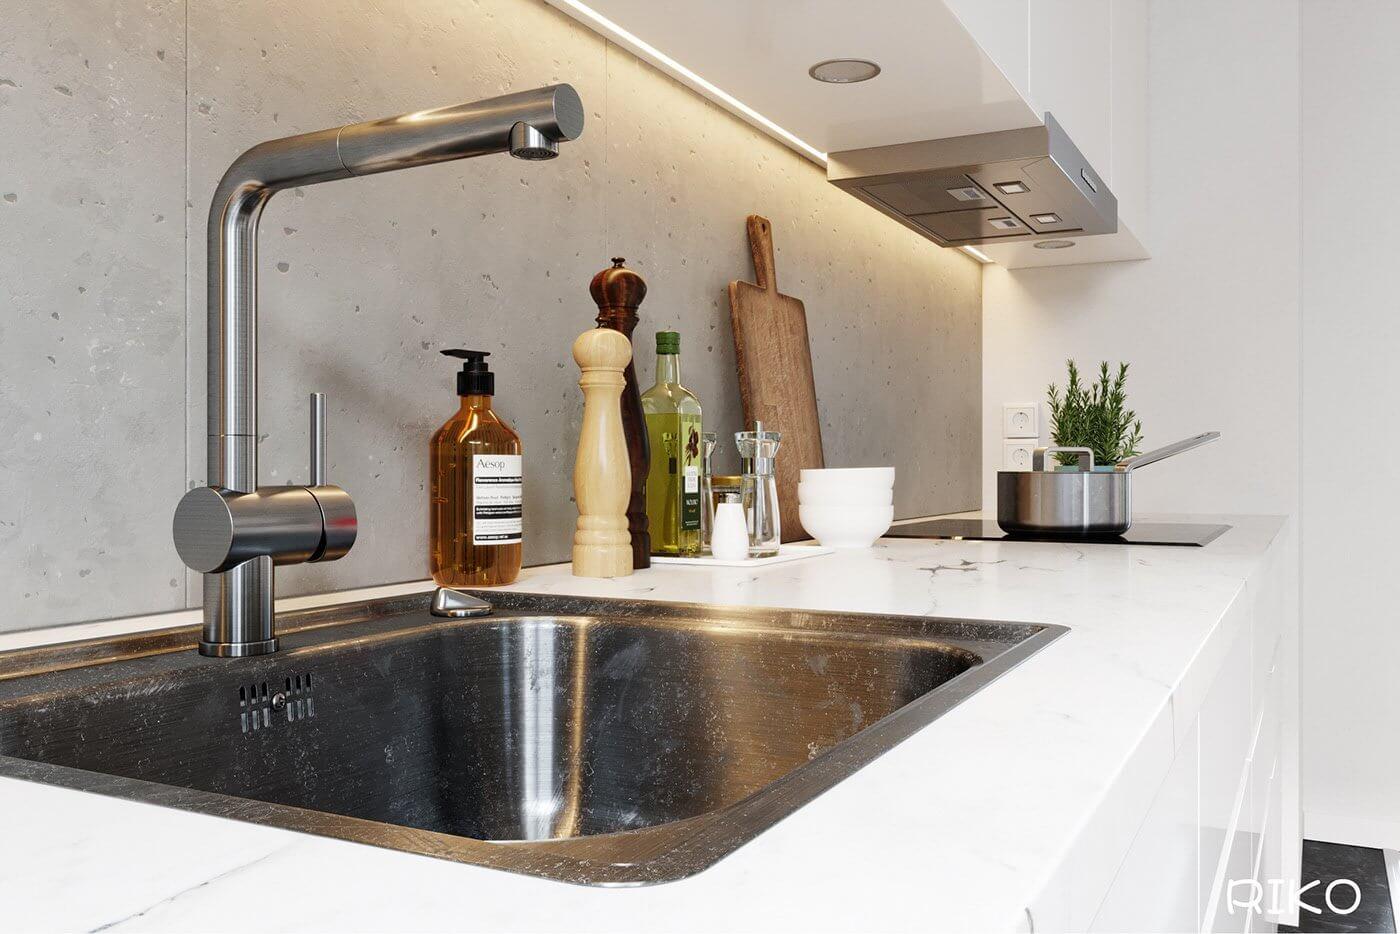 White kitchen design accessoires wash basin - cgi visualization